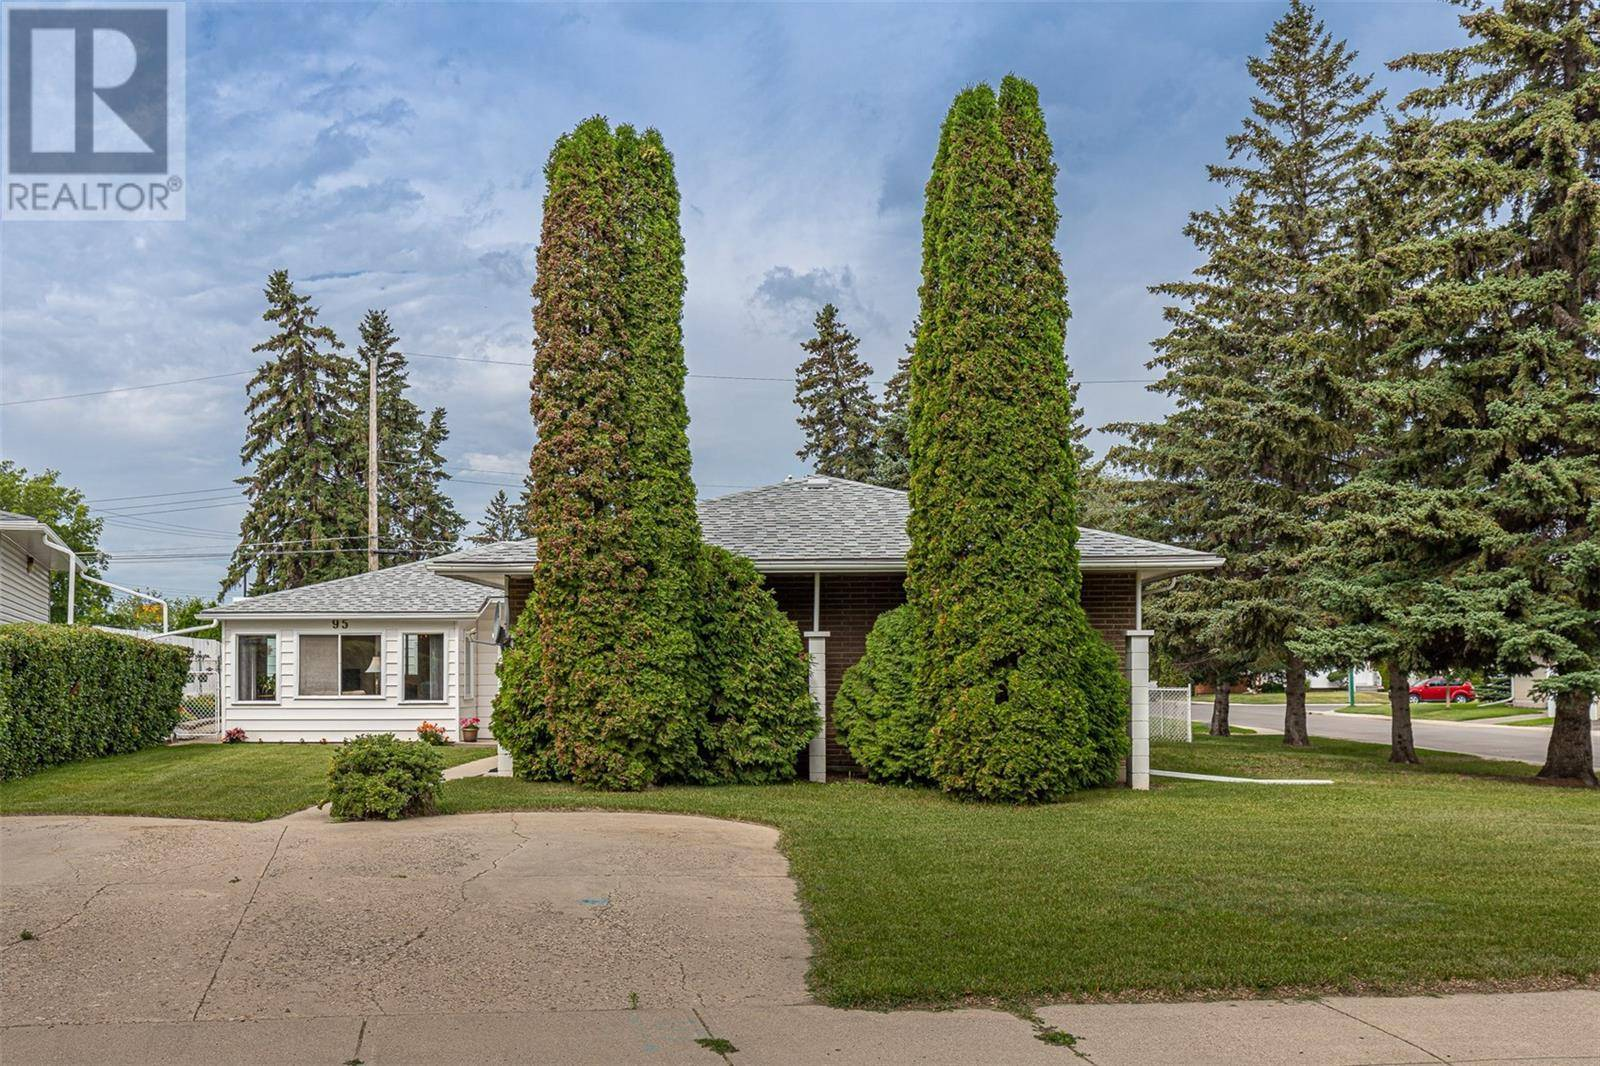 House for sale at 95 O'neil Cres Saskatoon Saskatchewan - MLS: SK779466